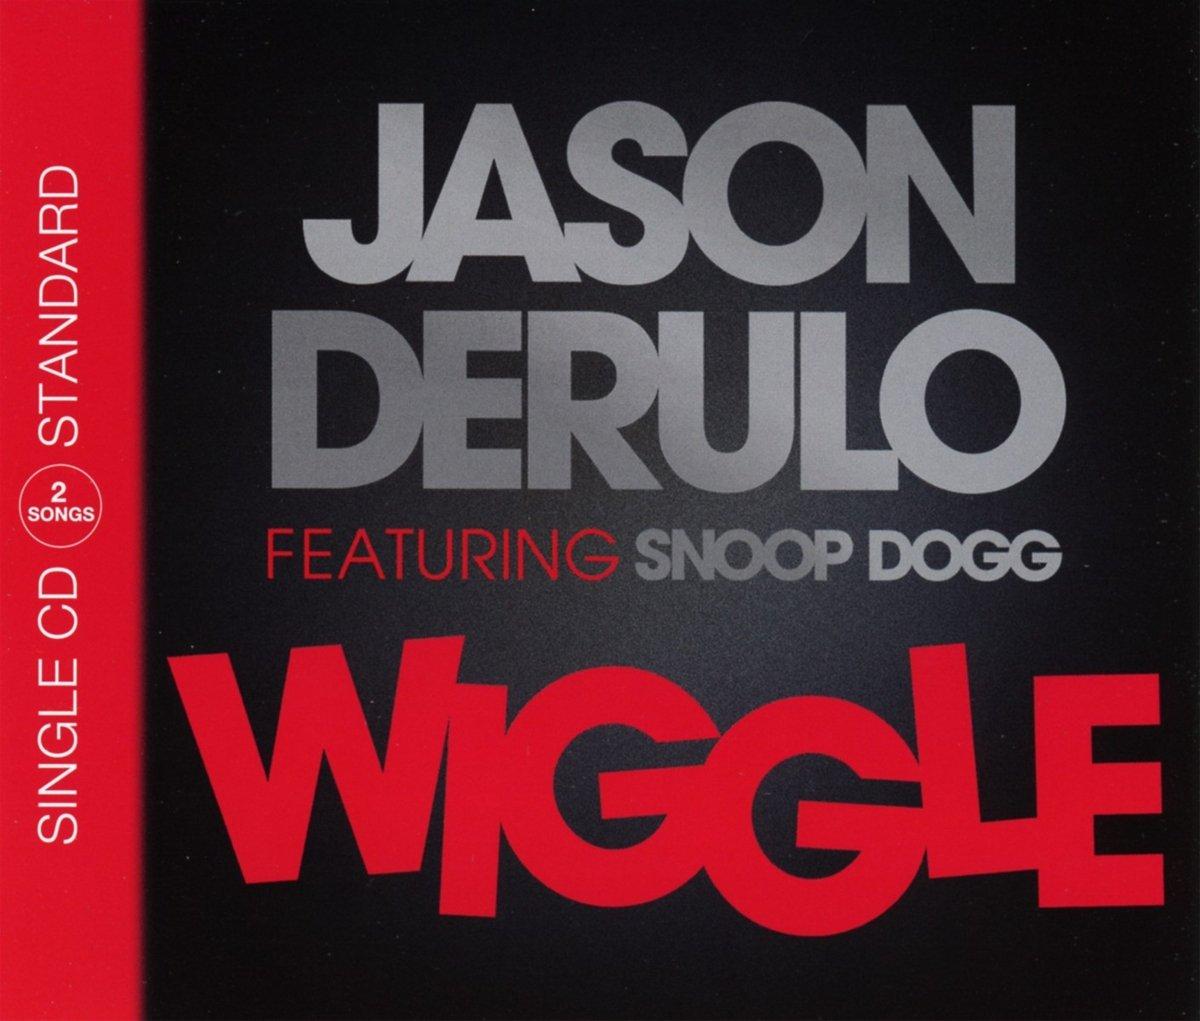 Wiggle (2-Track) - Jason Feat. Snoop Dogg Derulo: Amazon.de: Musik